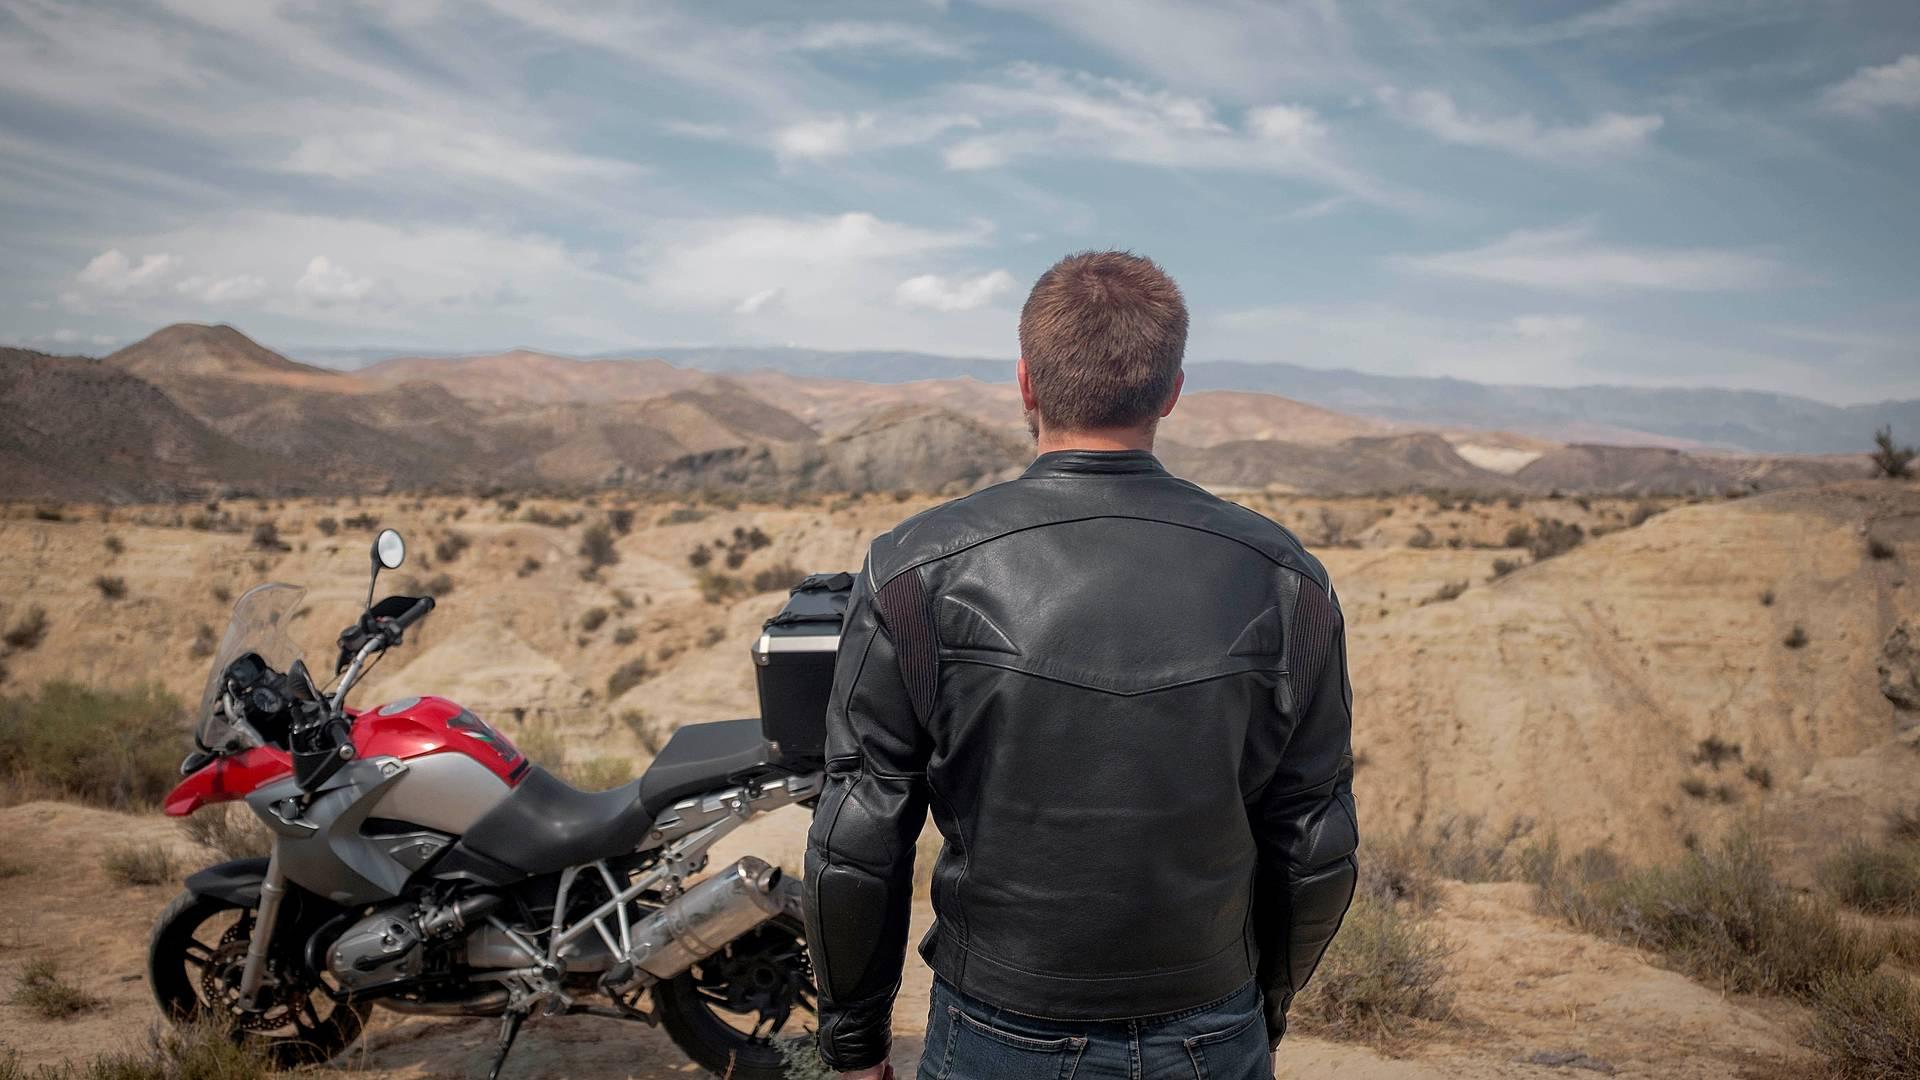 In moto tra le dune del deserto